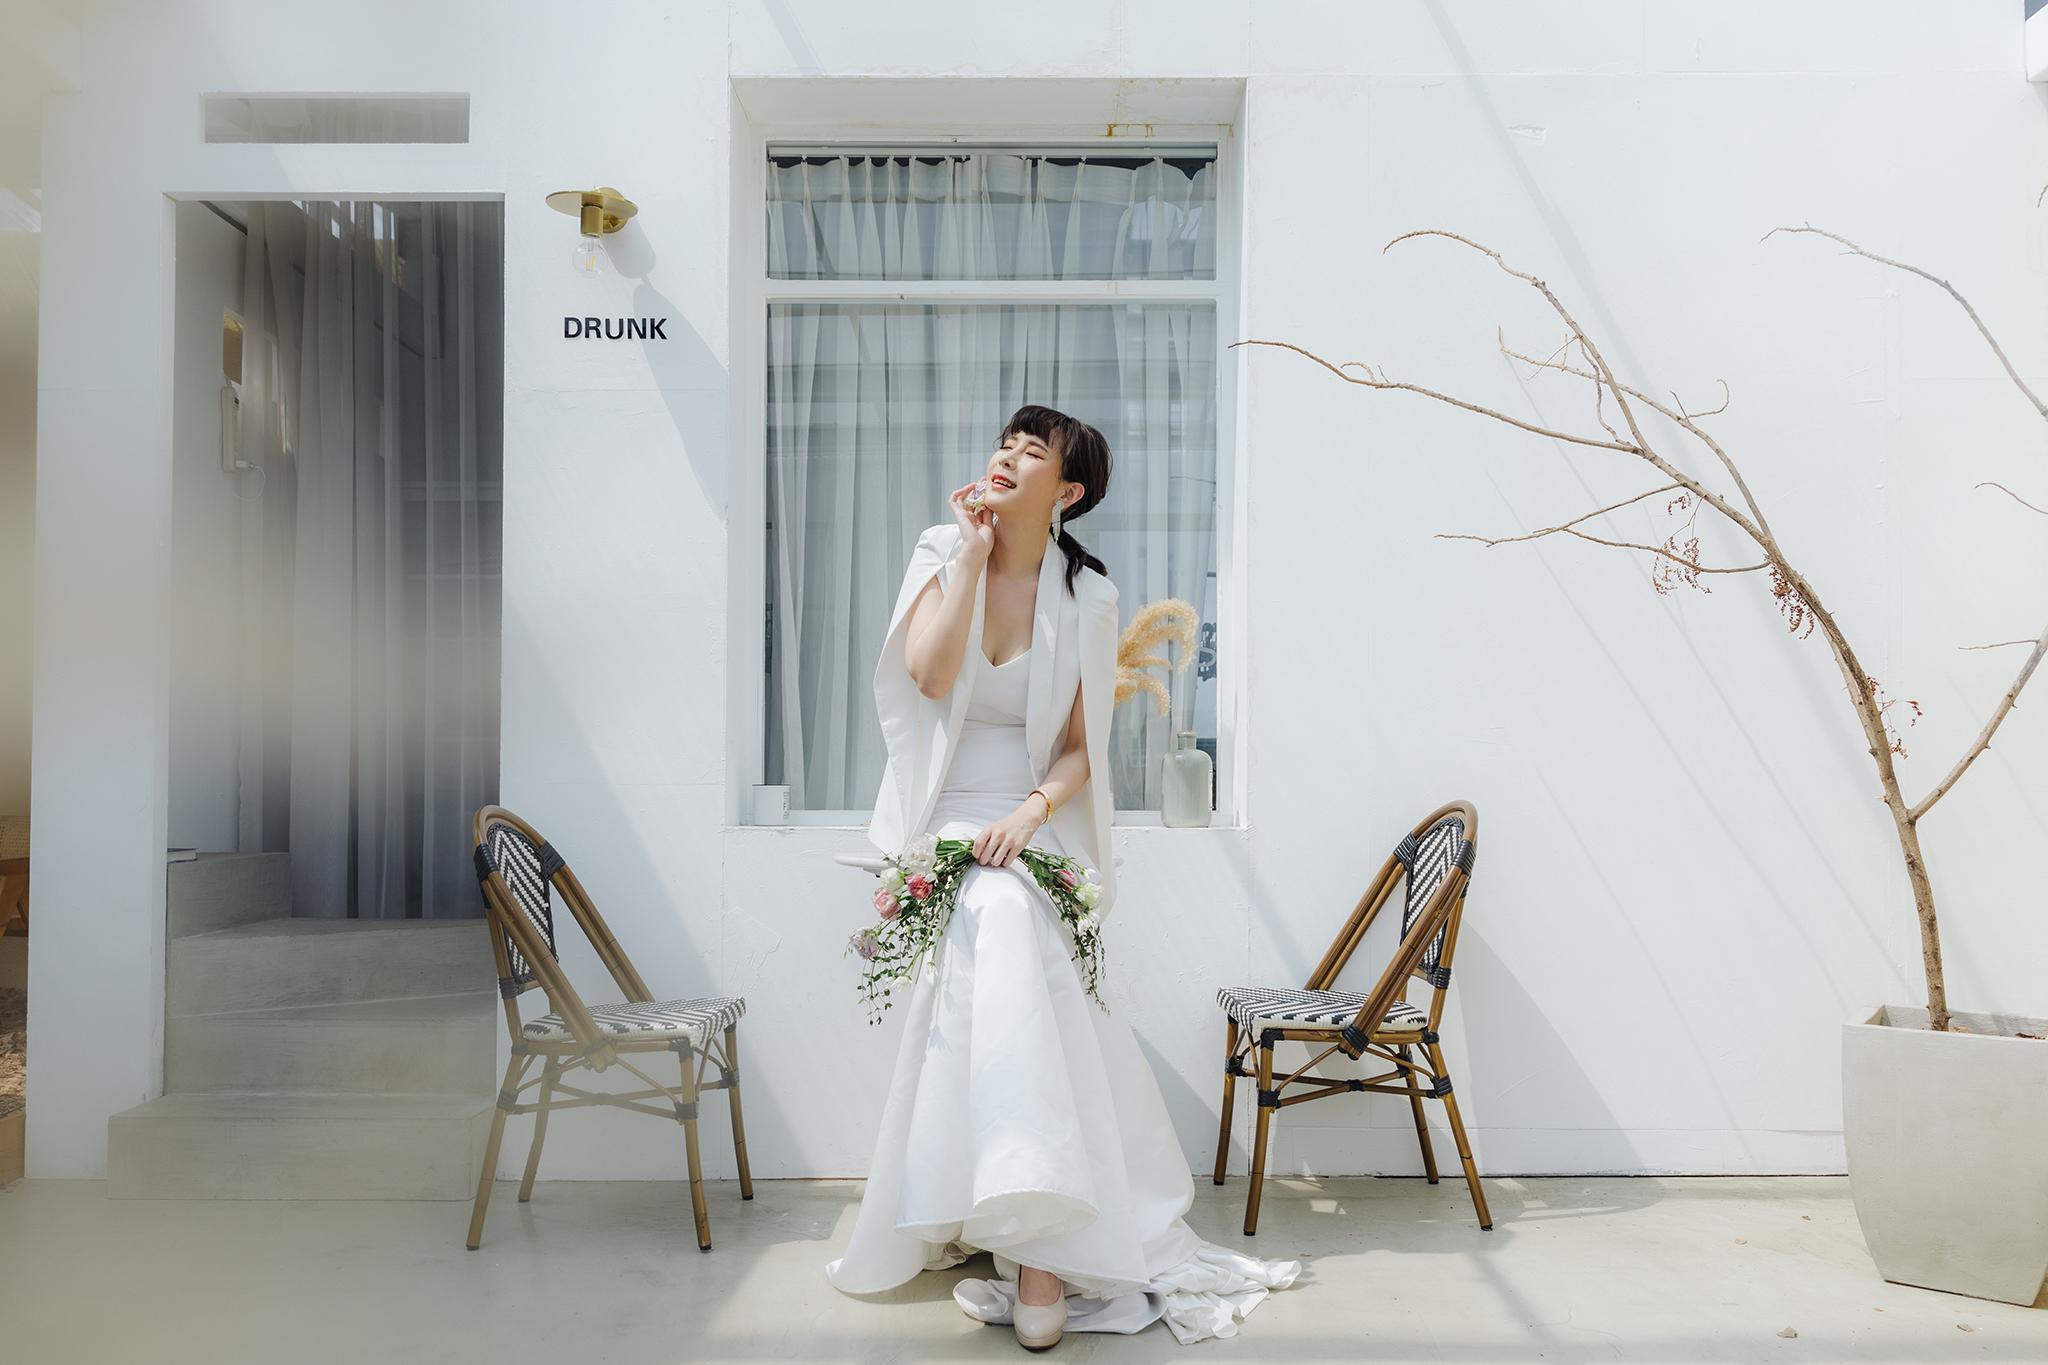 49883519332 22ff755524 o - 【自主婚紗】+潤潤+